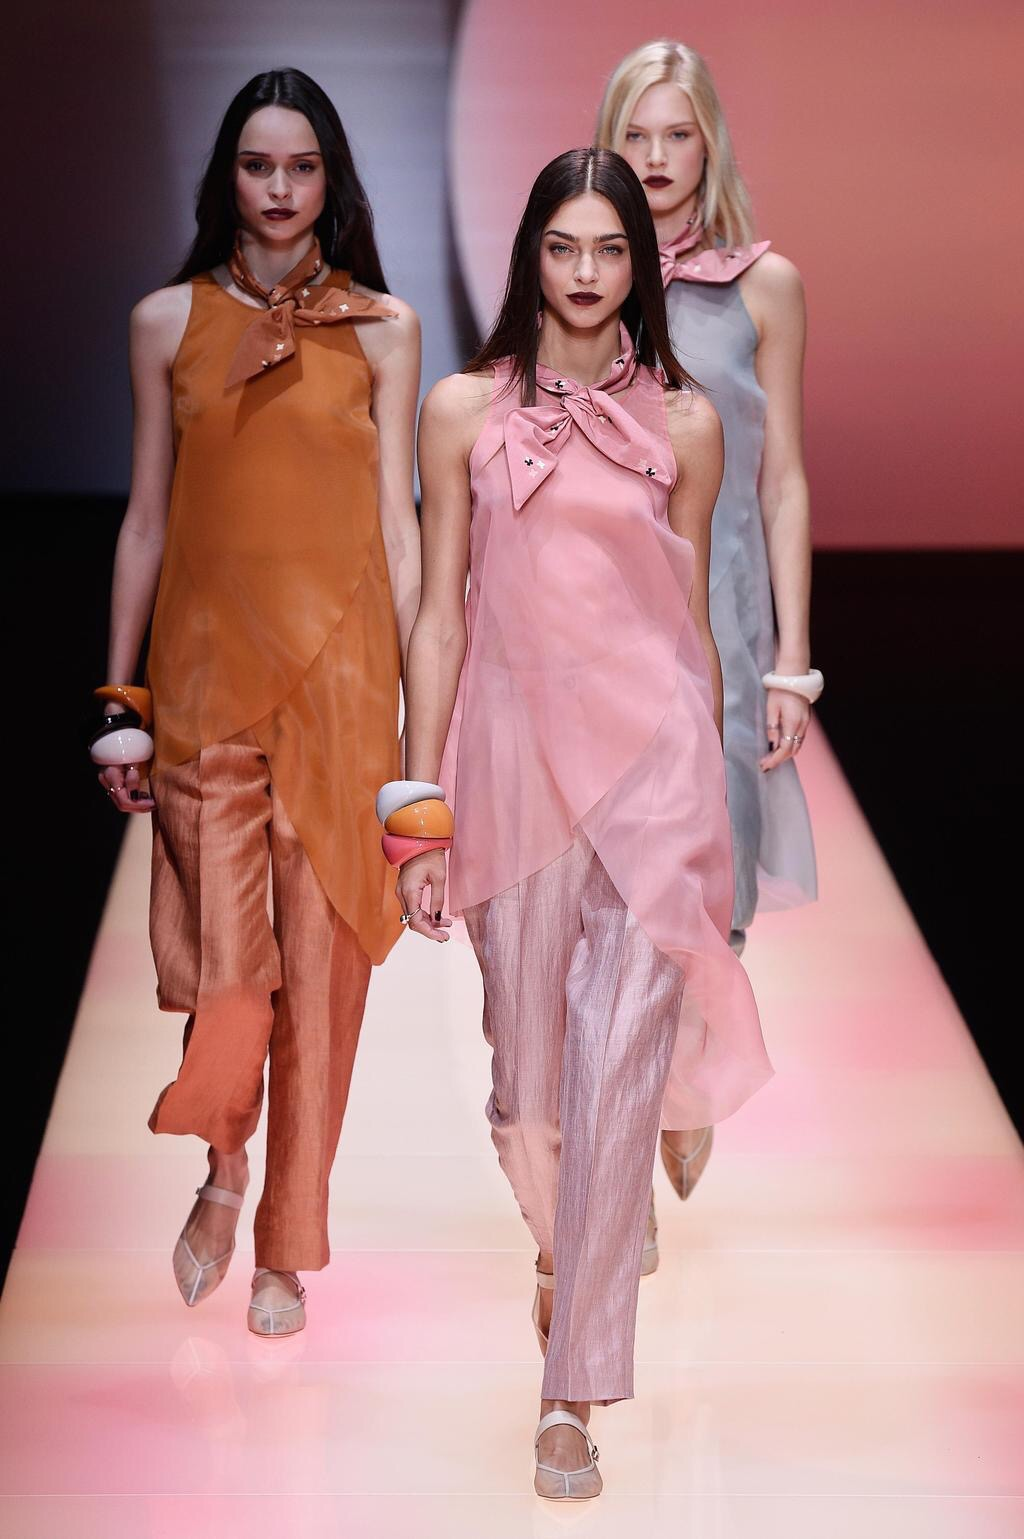 Tendencias | Fashion is the art